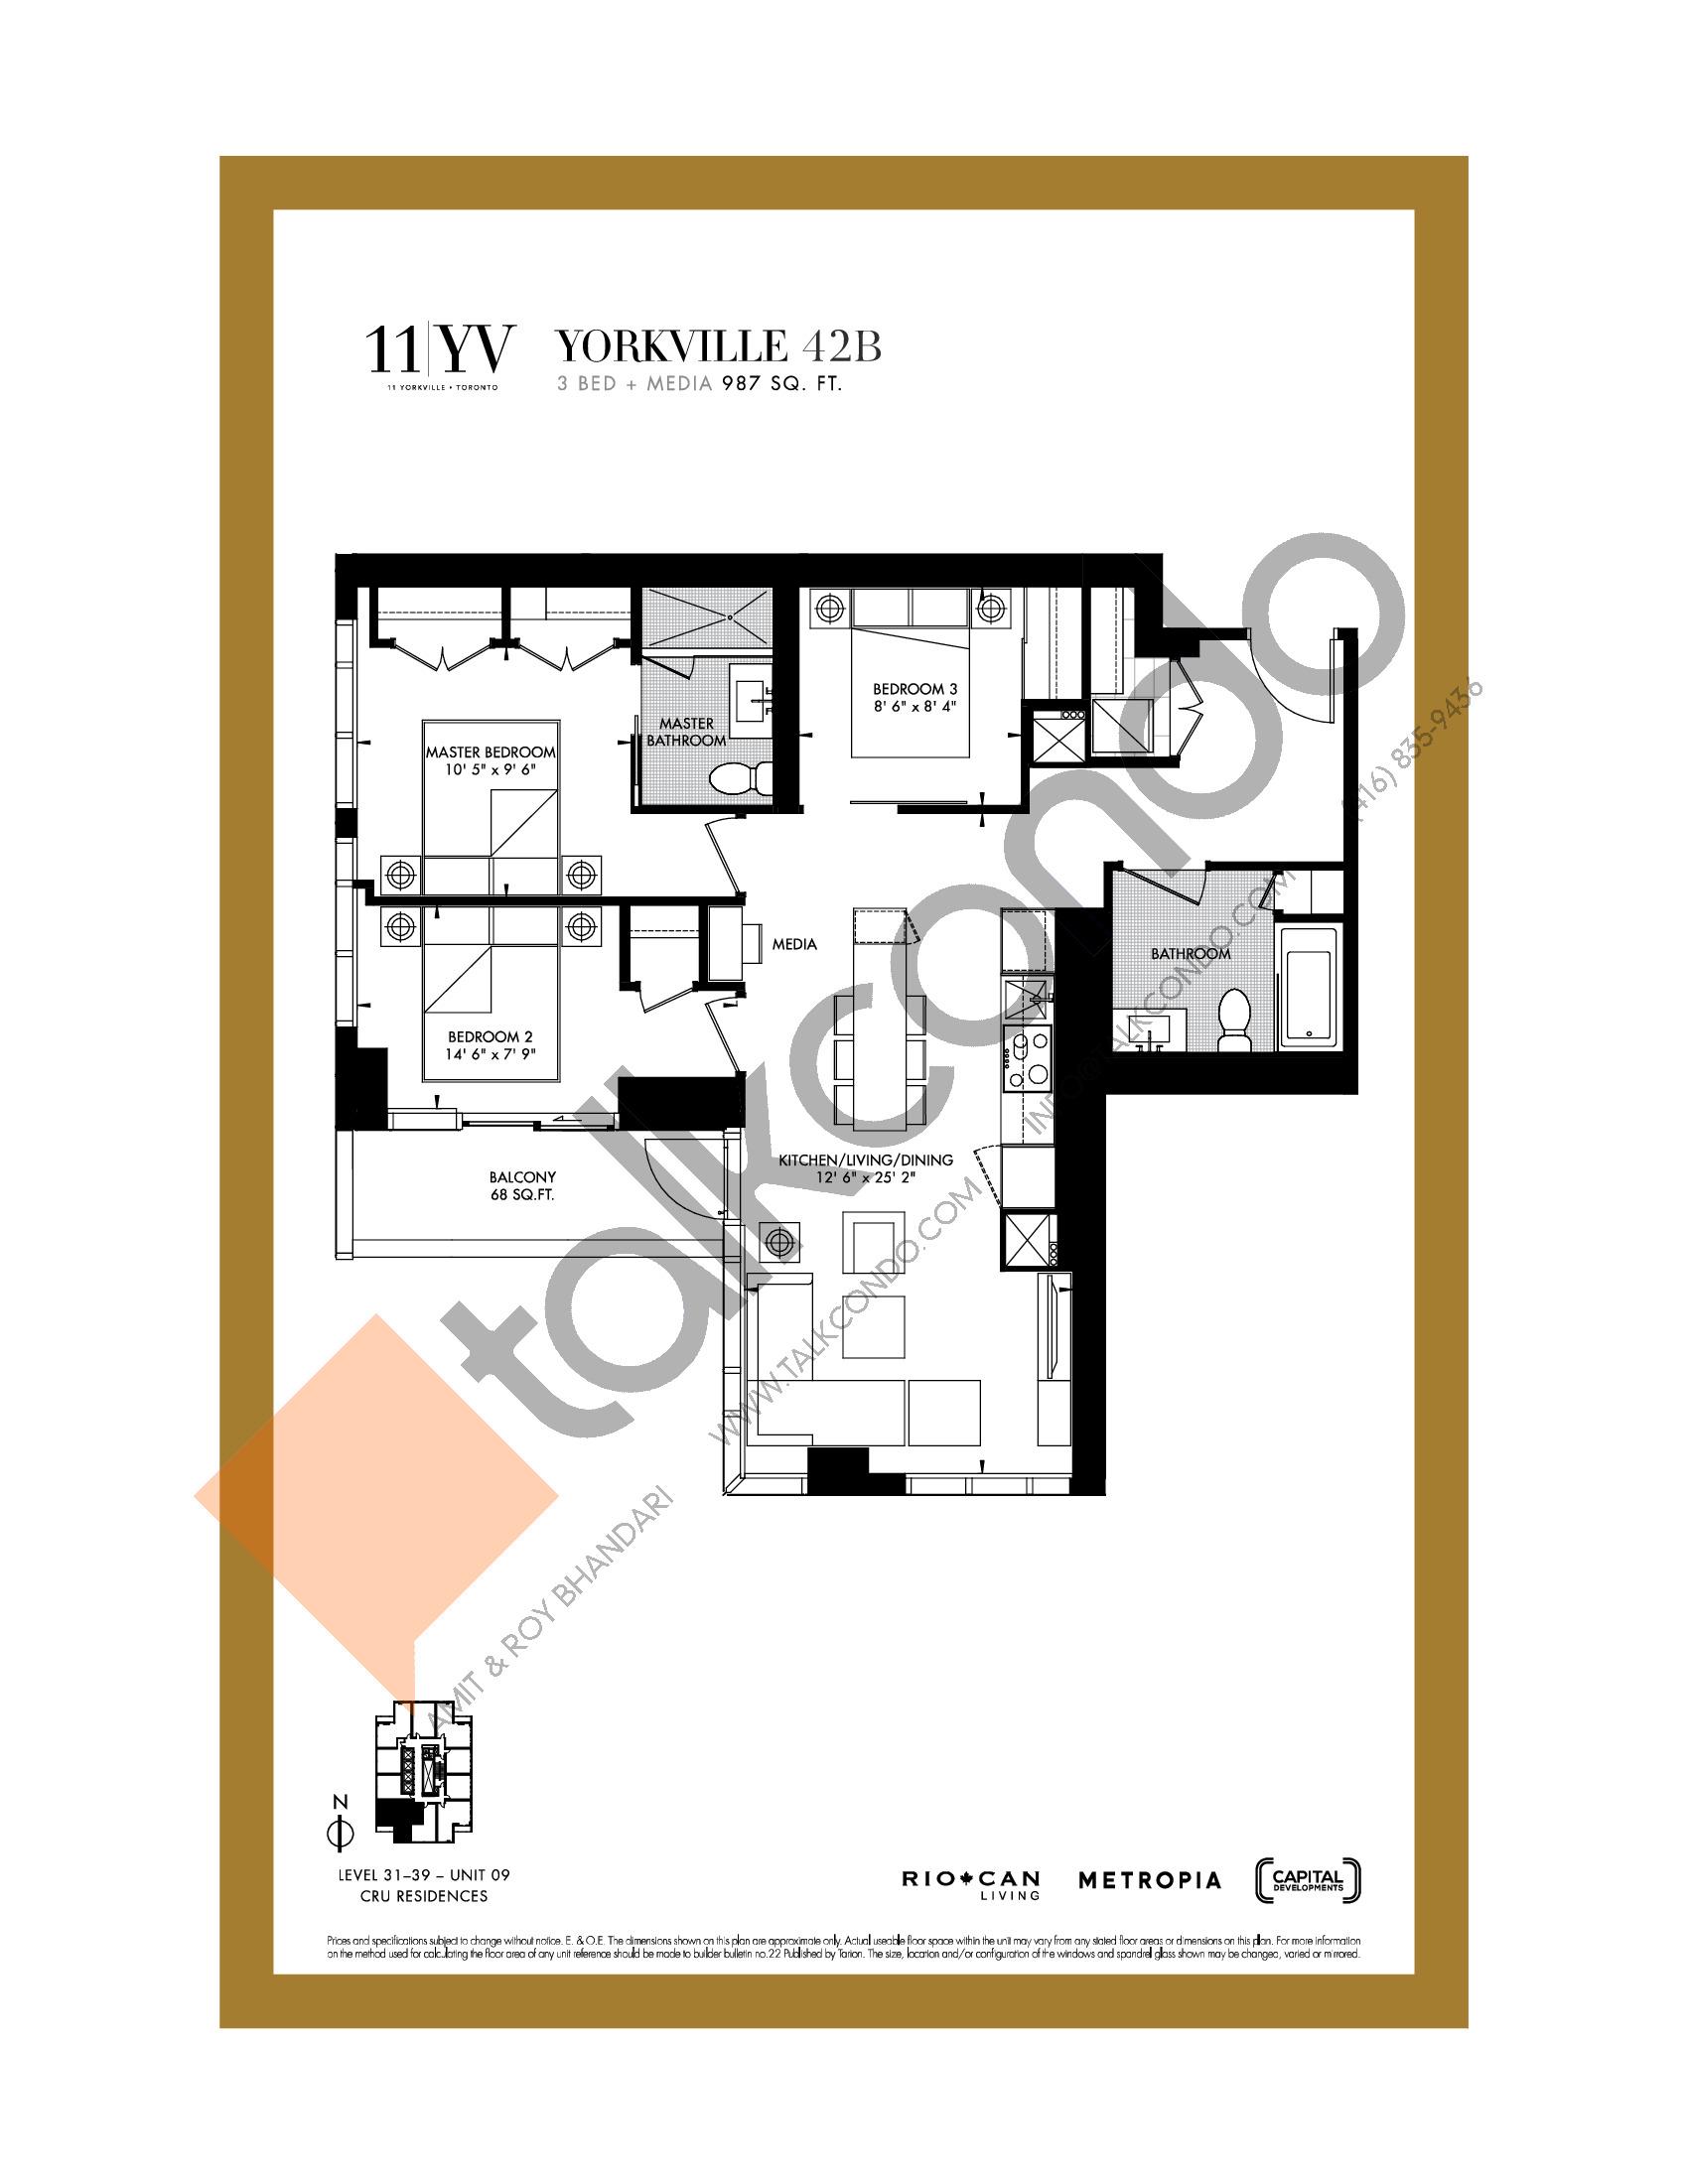 Yorkville 42B Floor Plan at 11YV Condos - 987 sq.ft